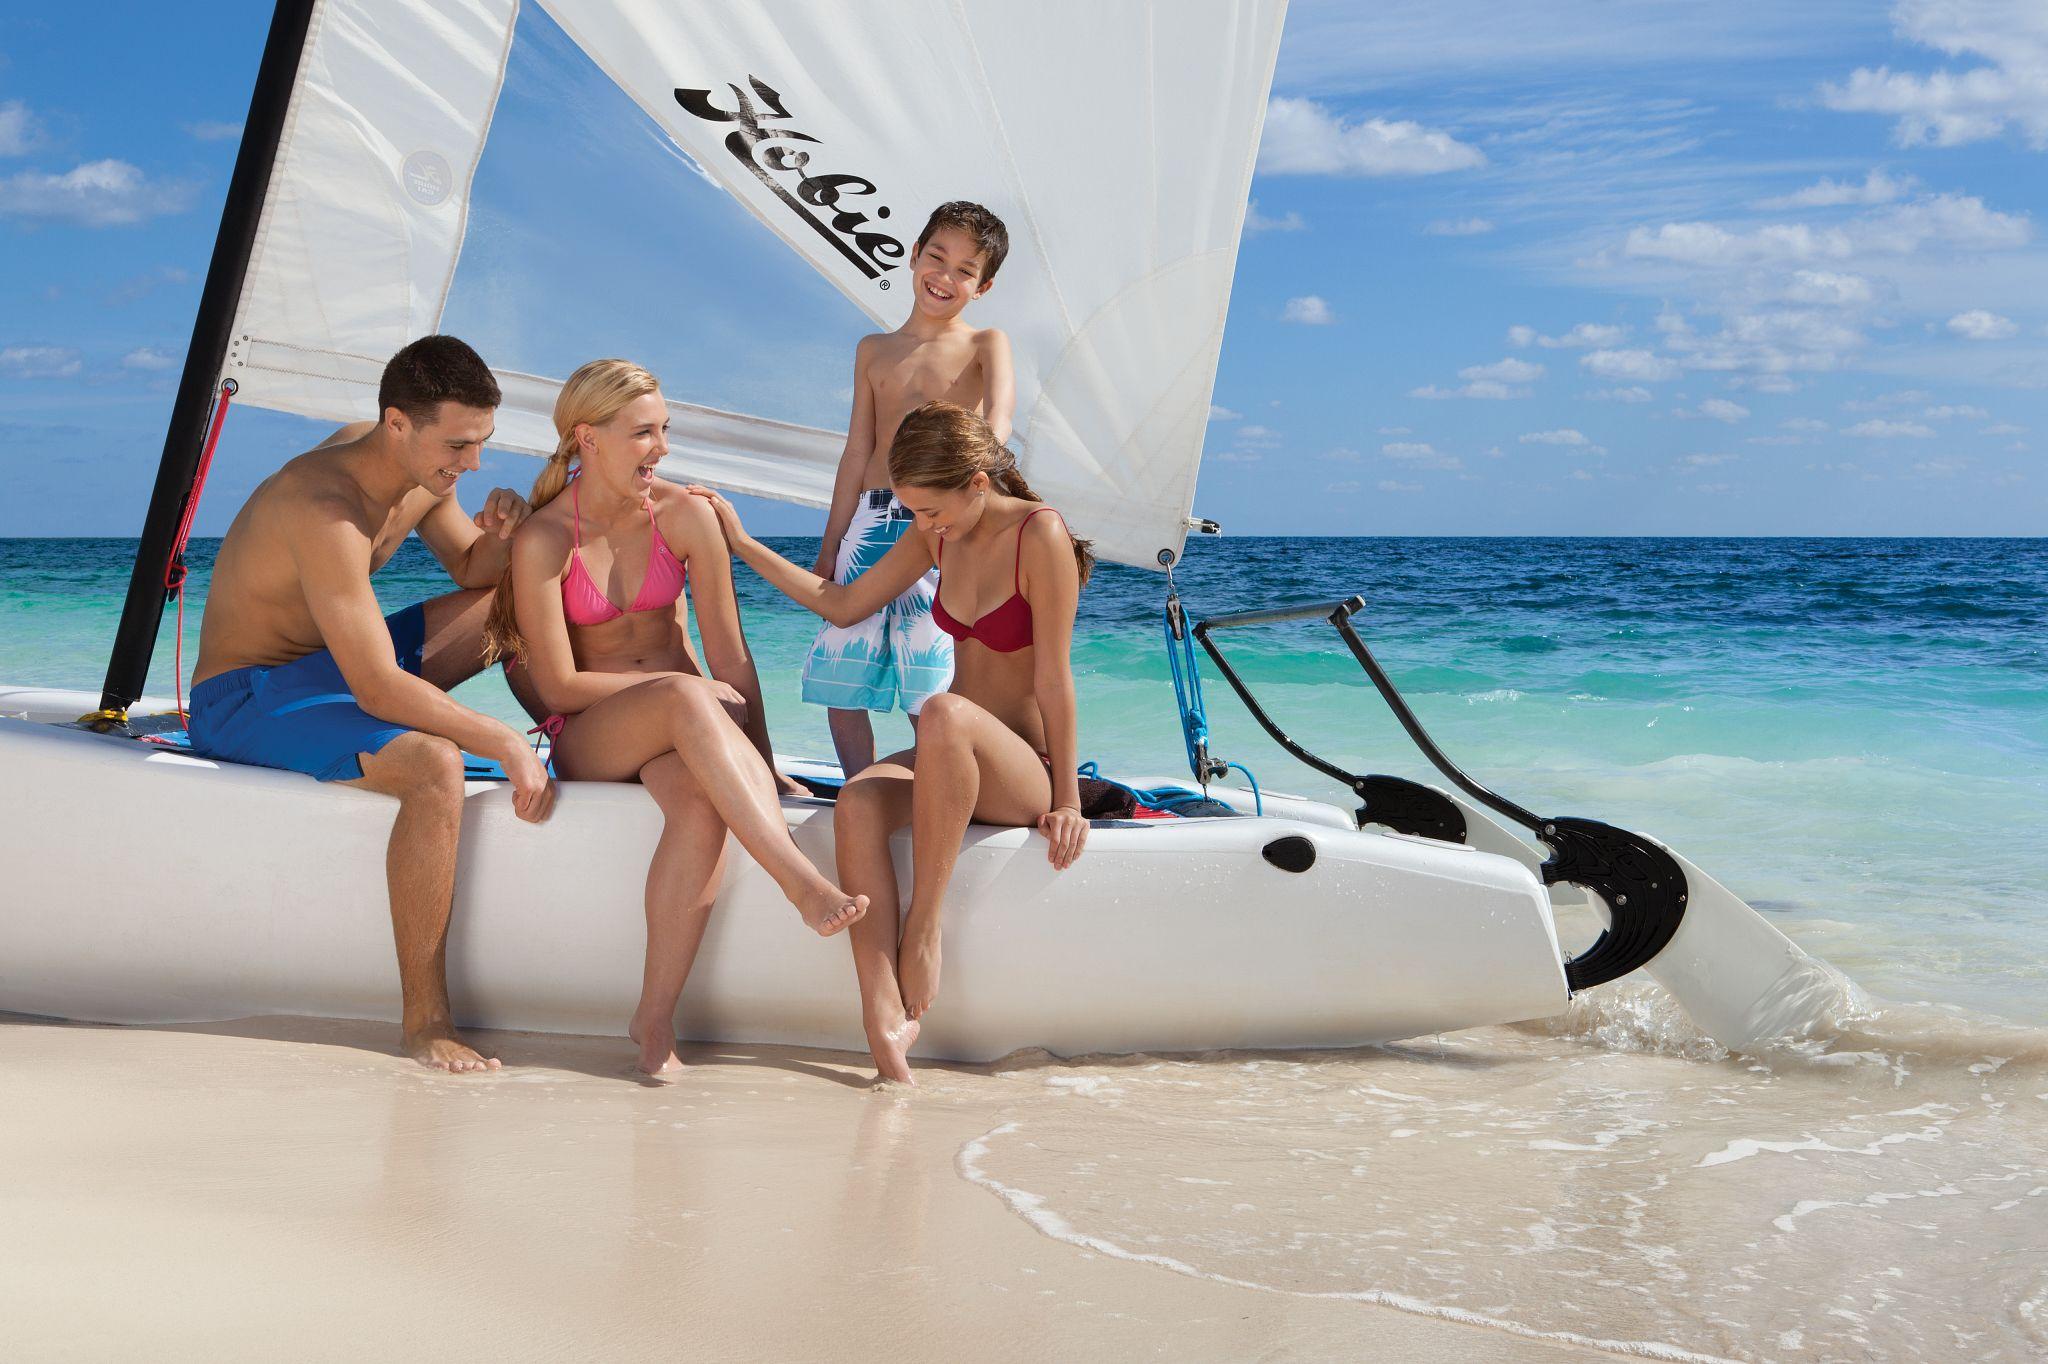 Family sitting on a catamaran on the beach